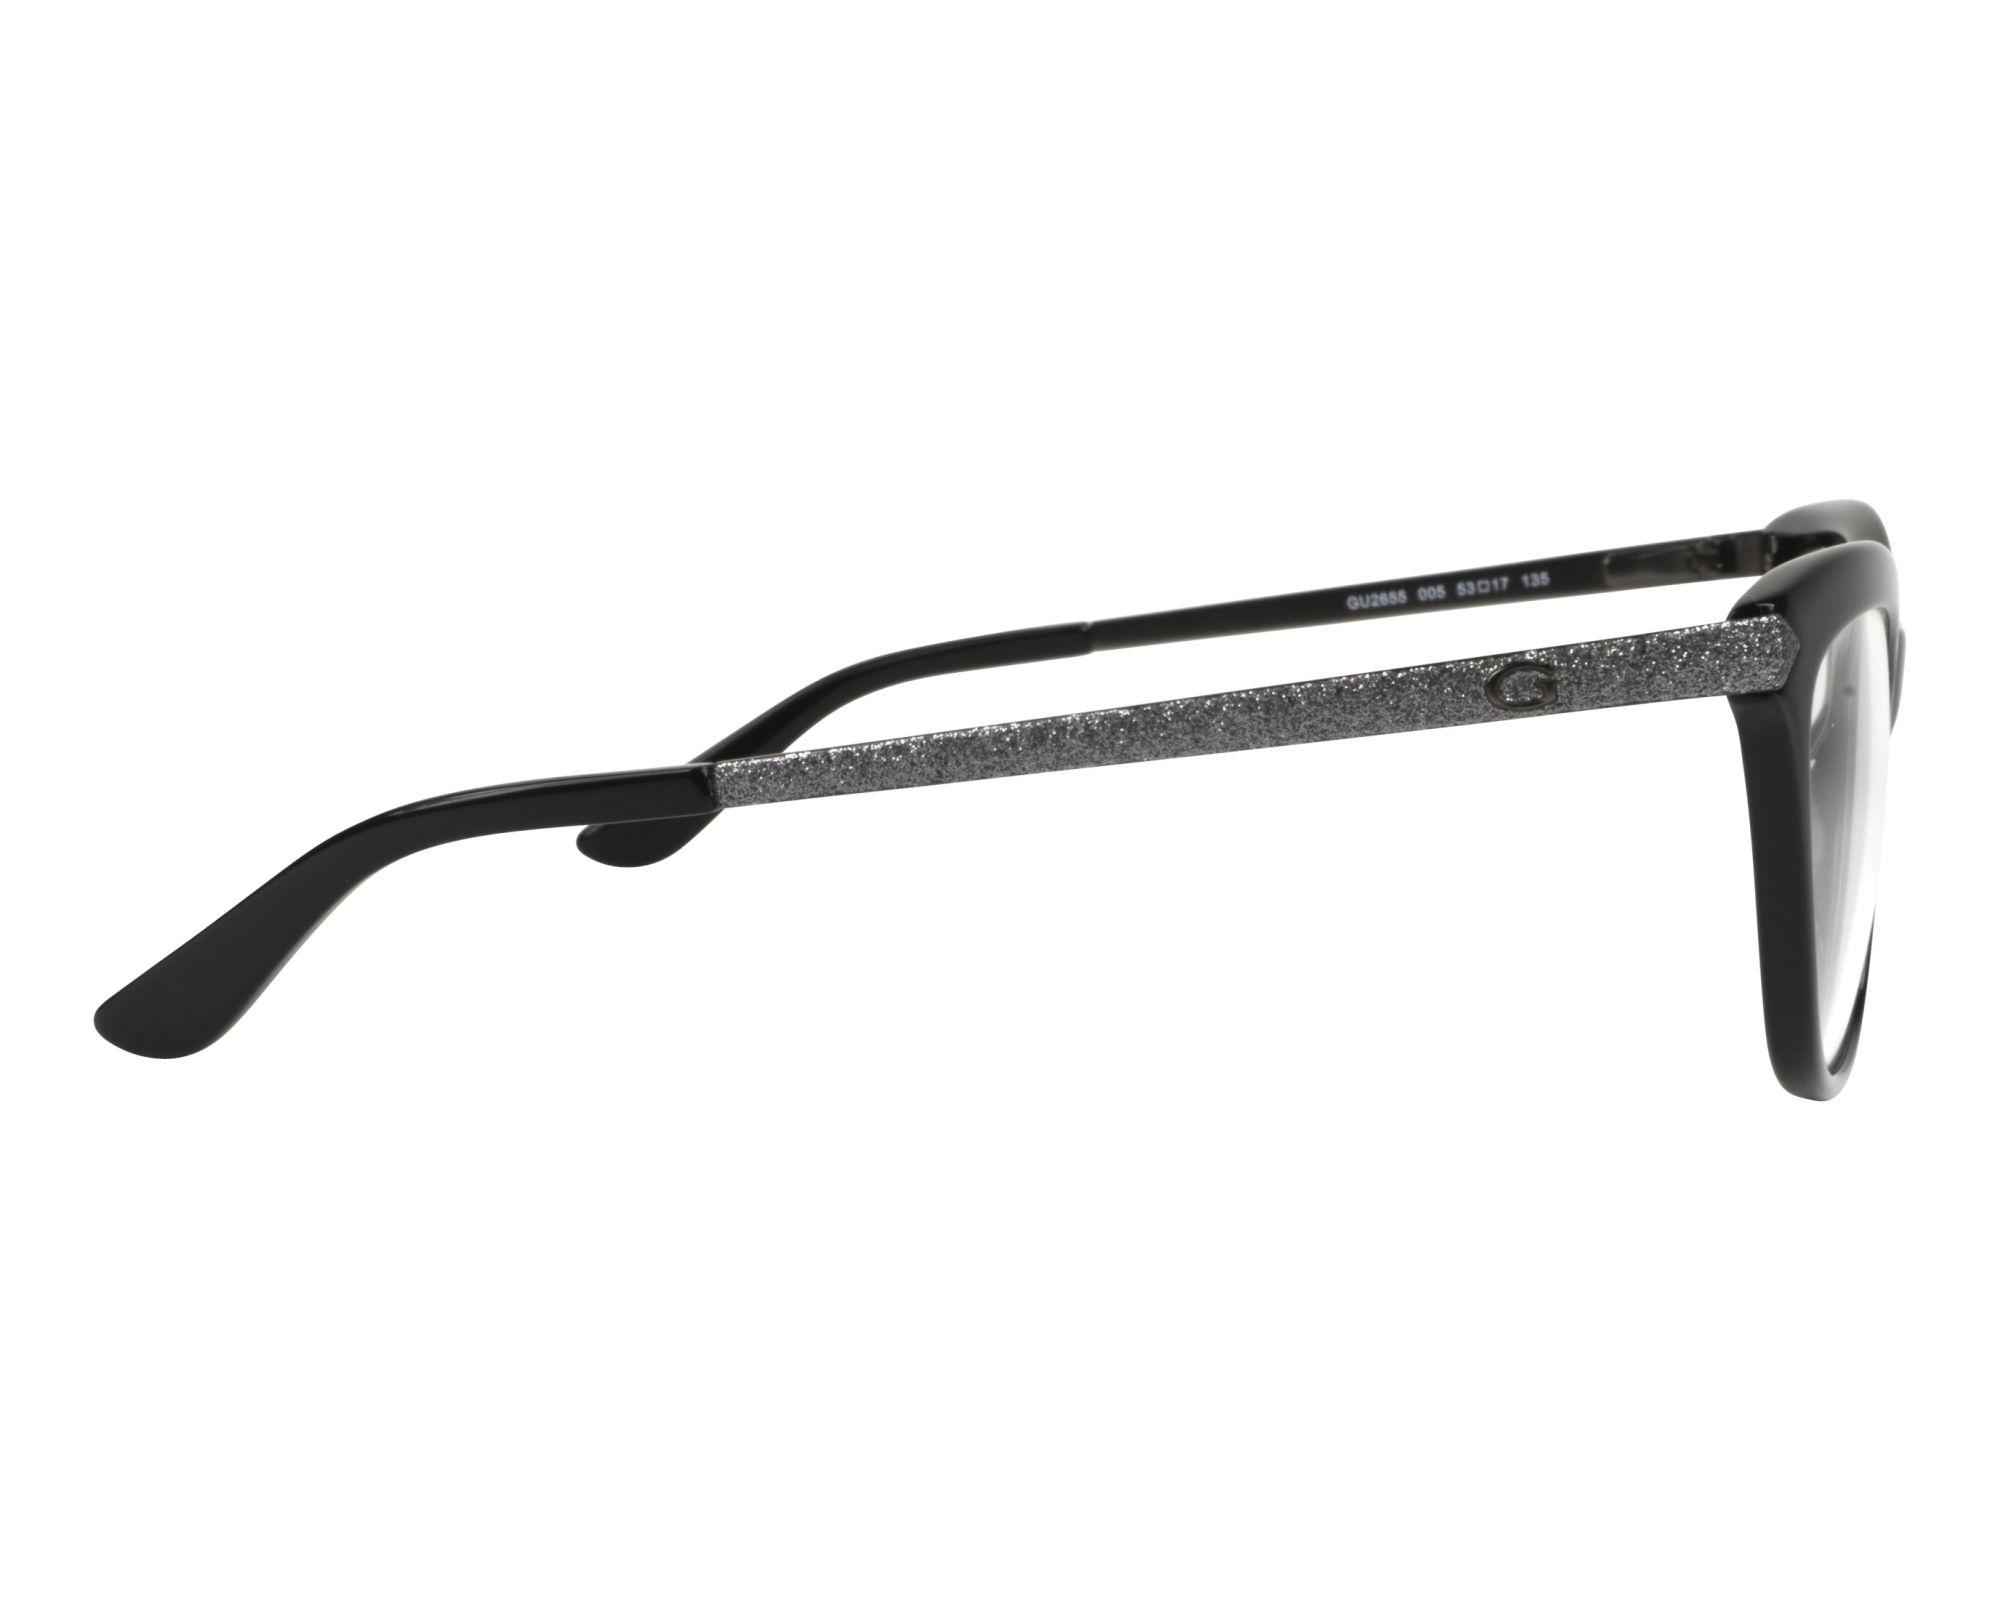 b79ff2dde3e eyeglasses Guess GU-2655 005 53-17 Black Silver side view